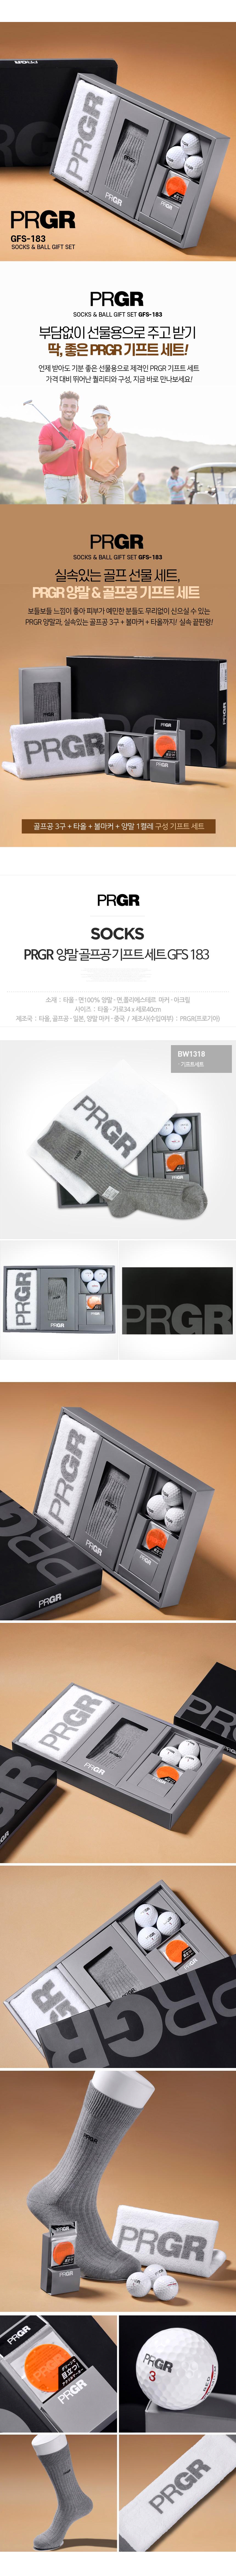 prgr_gift_set_GFS183_20.jpg